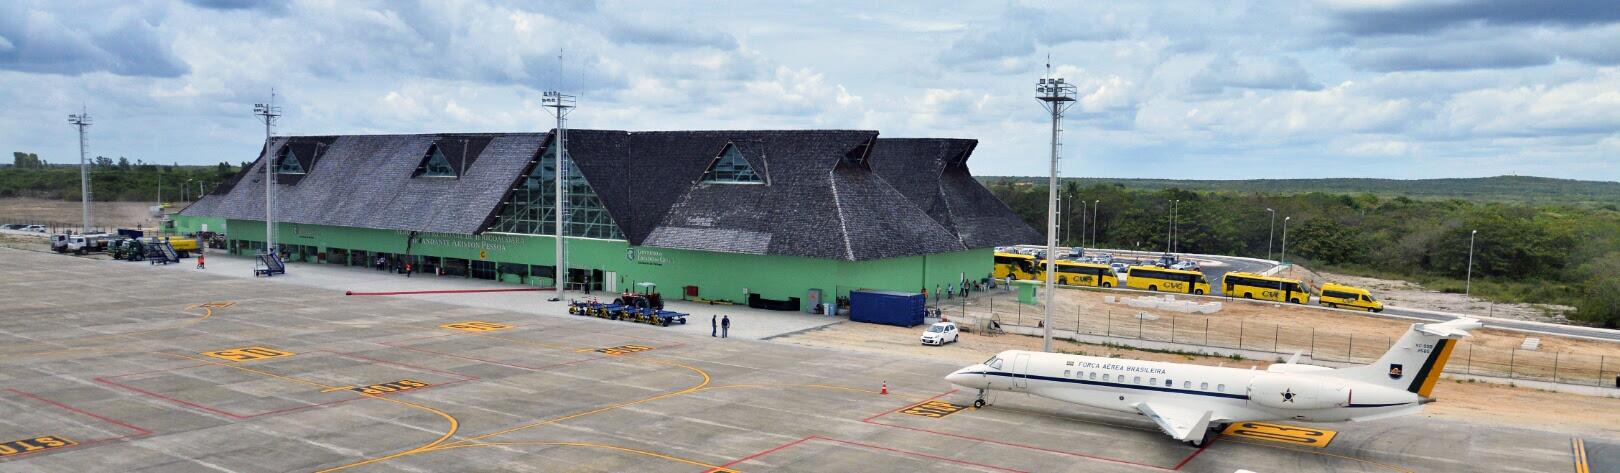 Resultado de imagem para aeroporto de jericoacoara